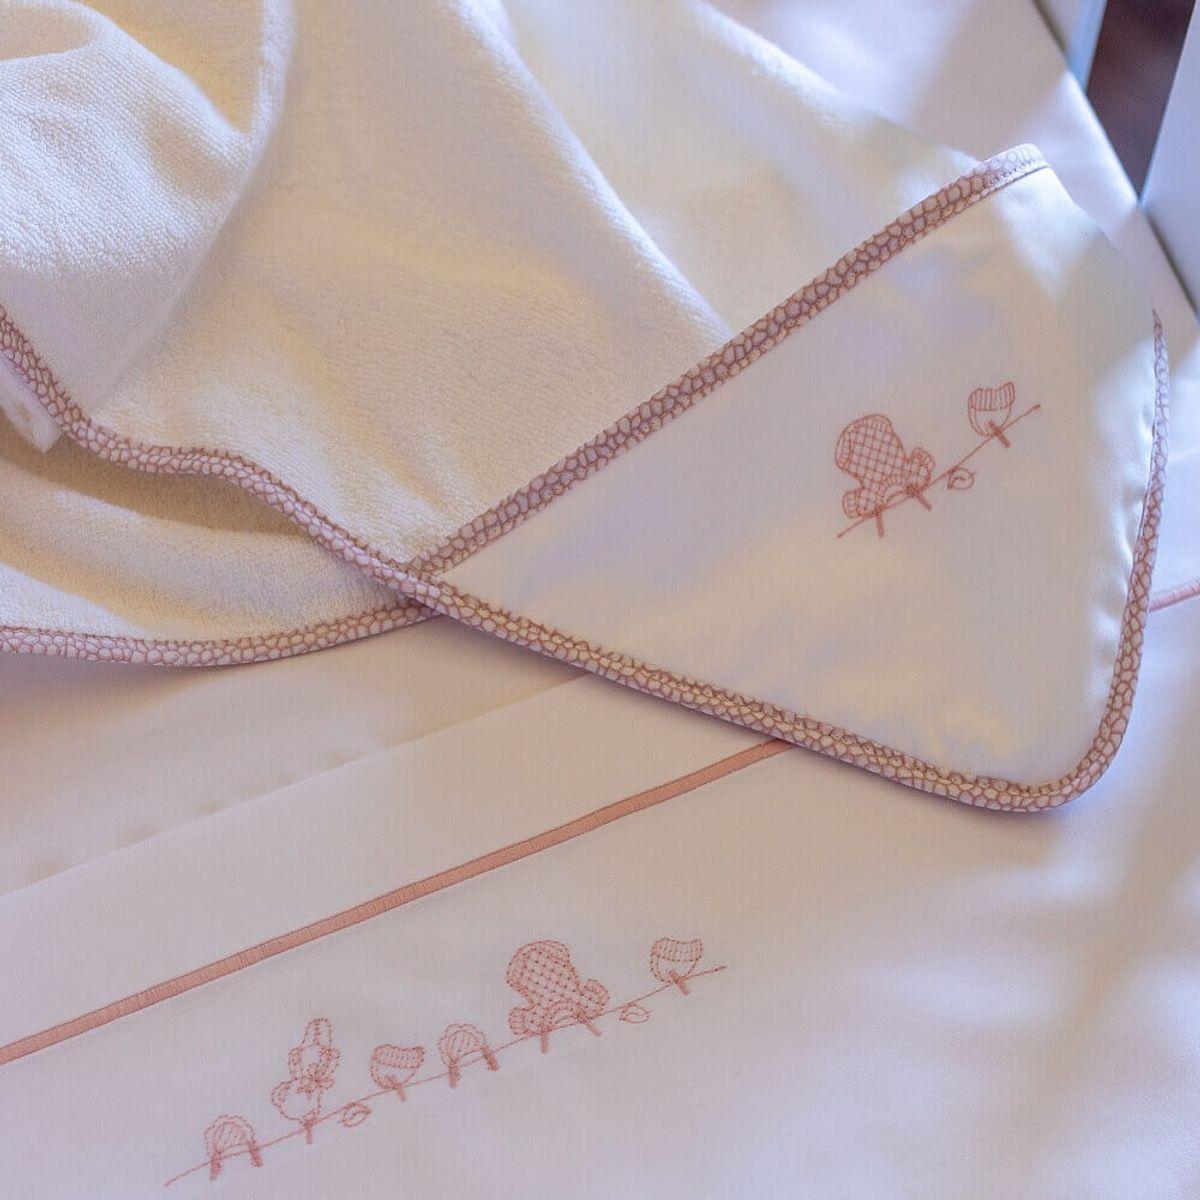 toalha-de-banho-baby-varal-rose-01